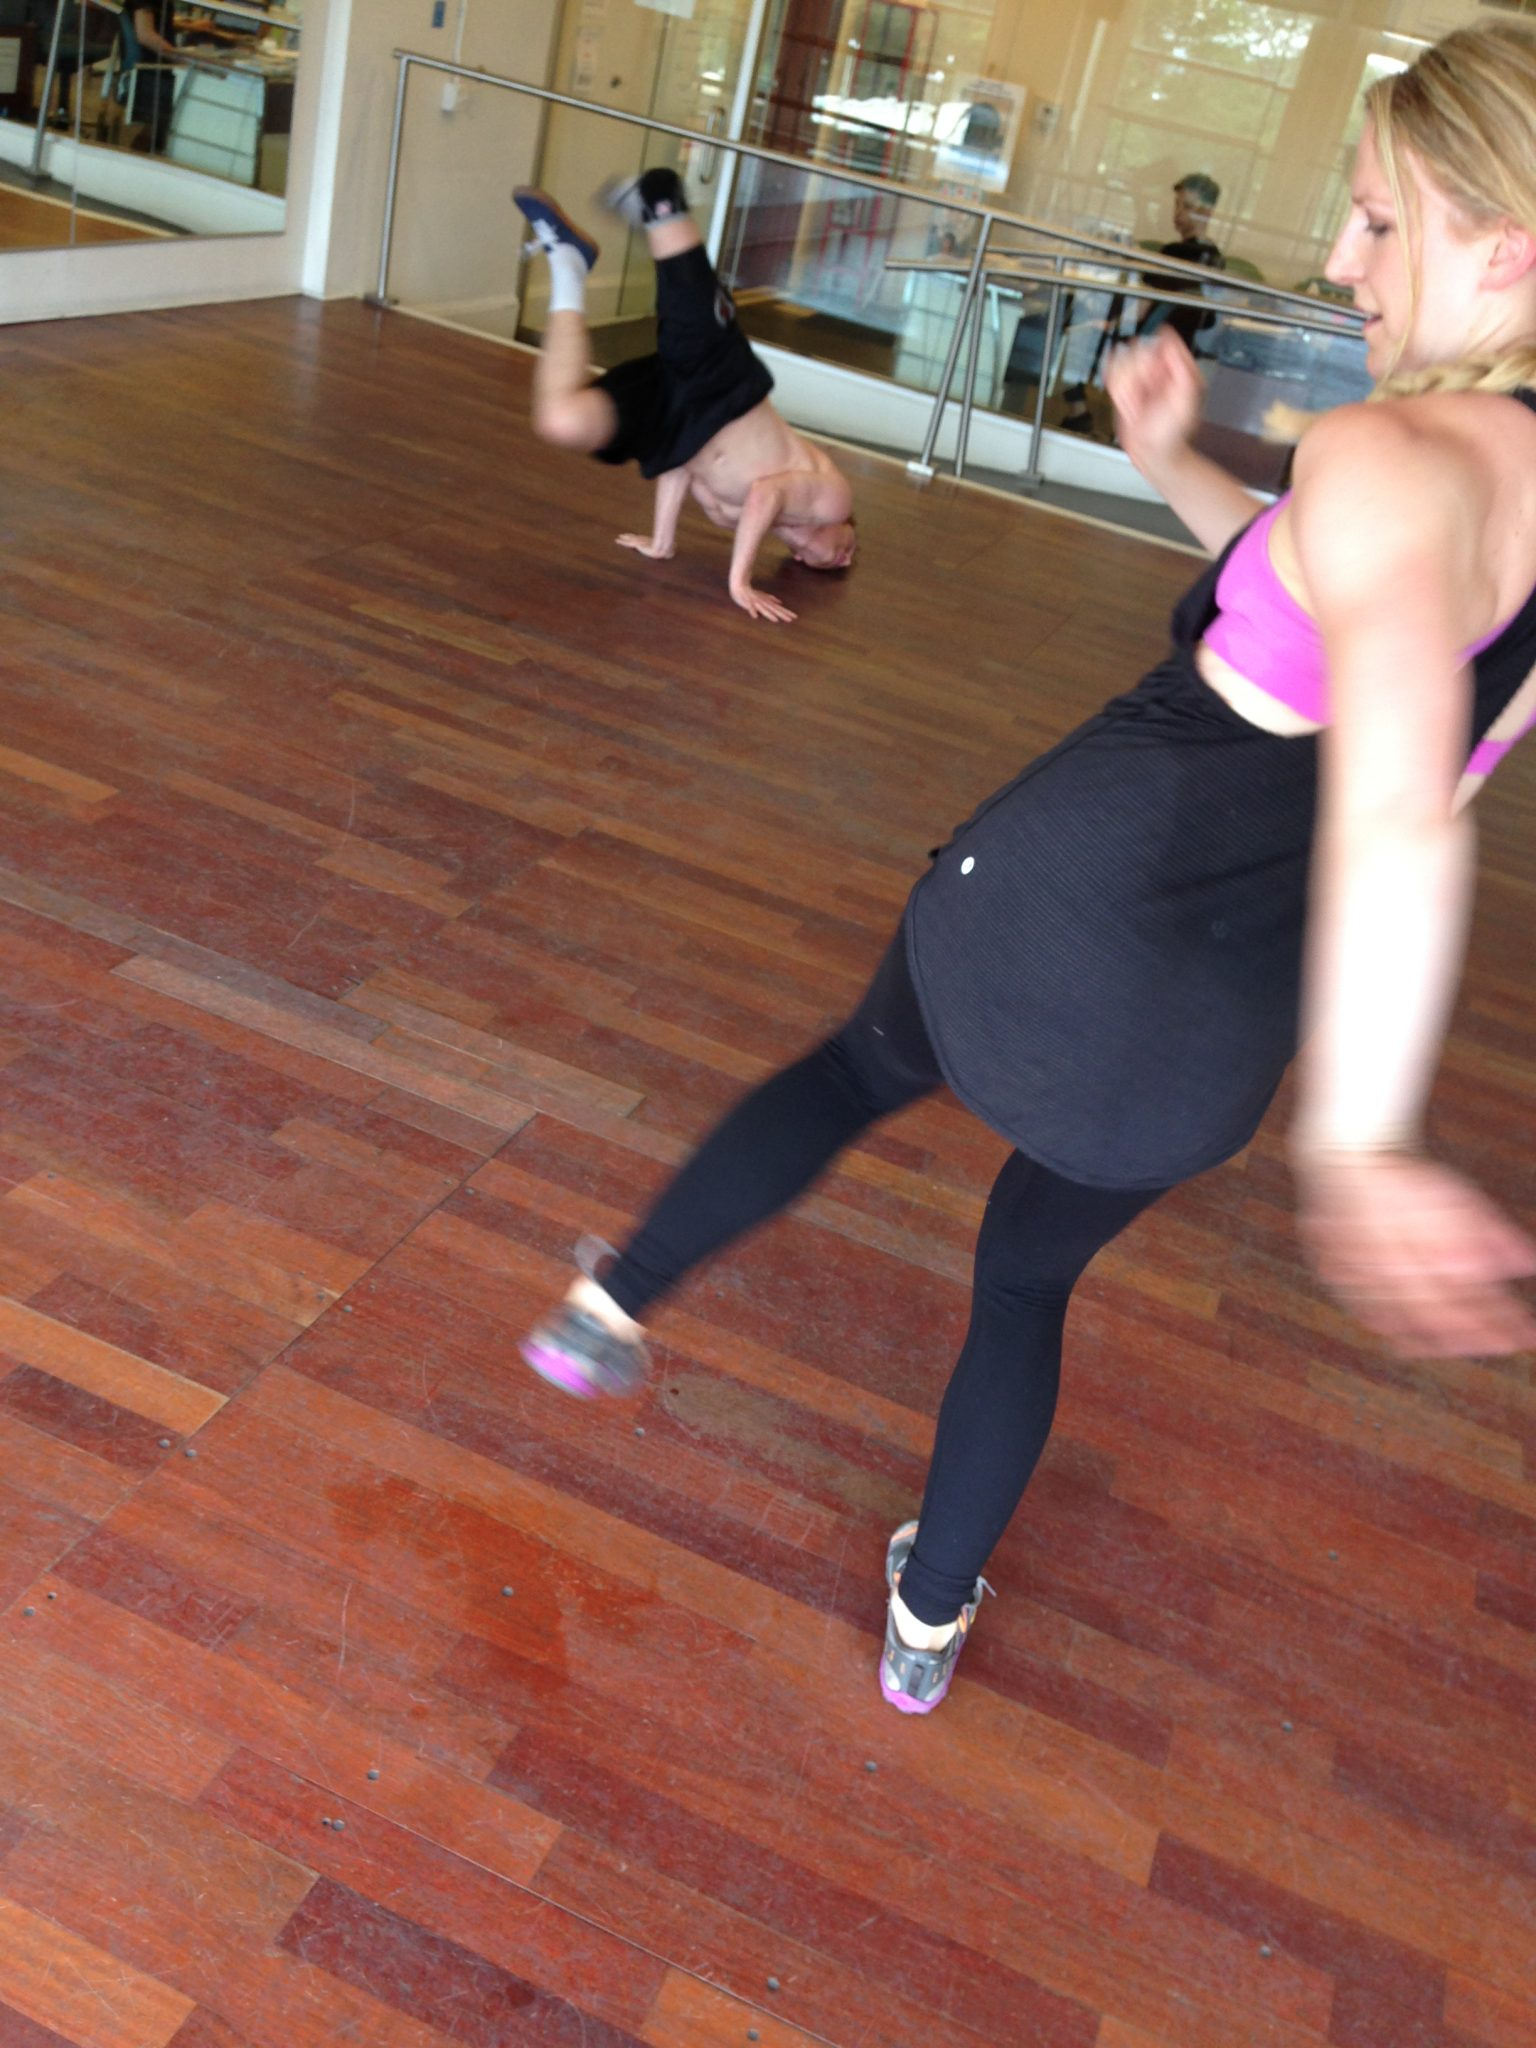 break dancing class in Chicago skateboarder asweatlife fabfitchiago